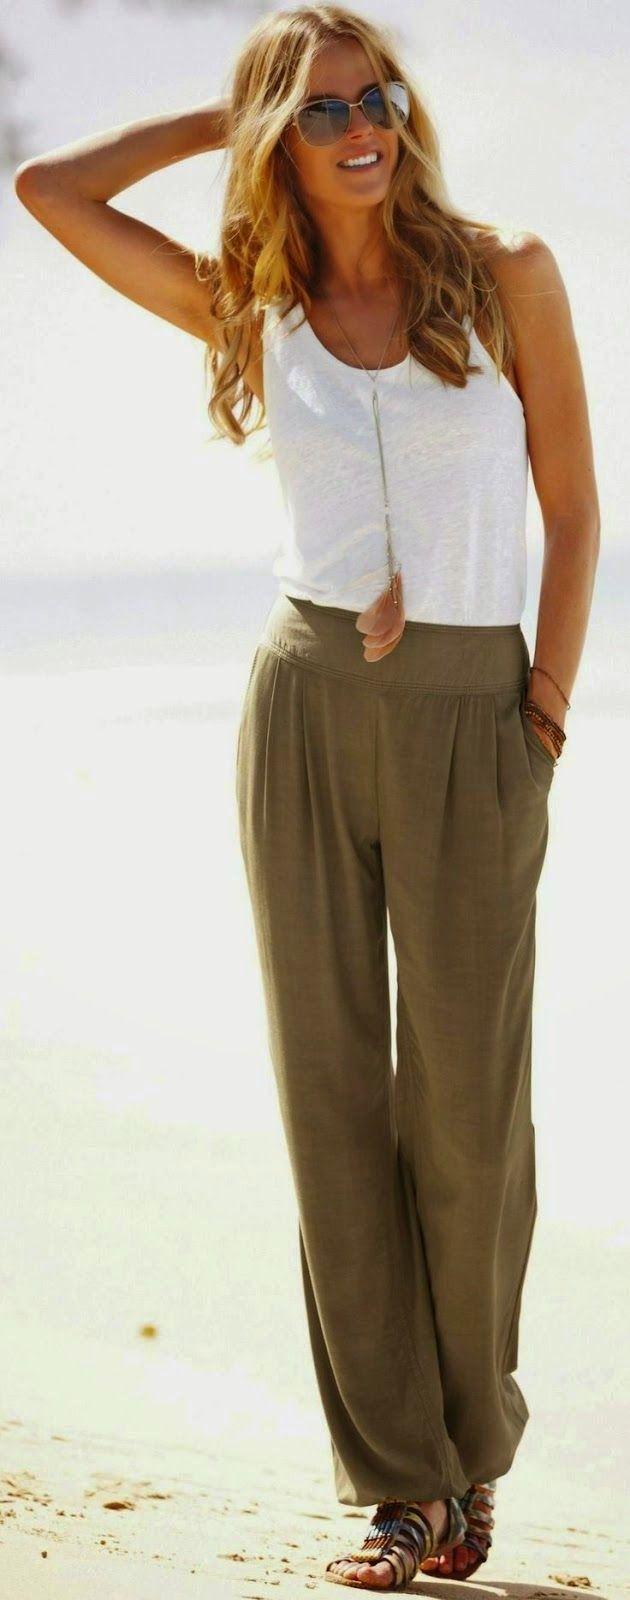 61a3cb1254c94 25 Summer Beach Outfits 2019 - Beach Outfit Ideas for Women | My ...